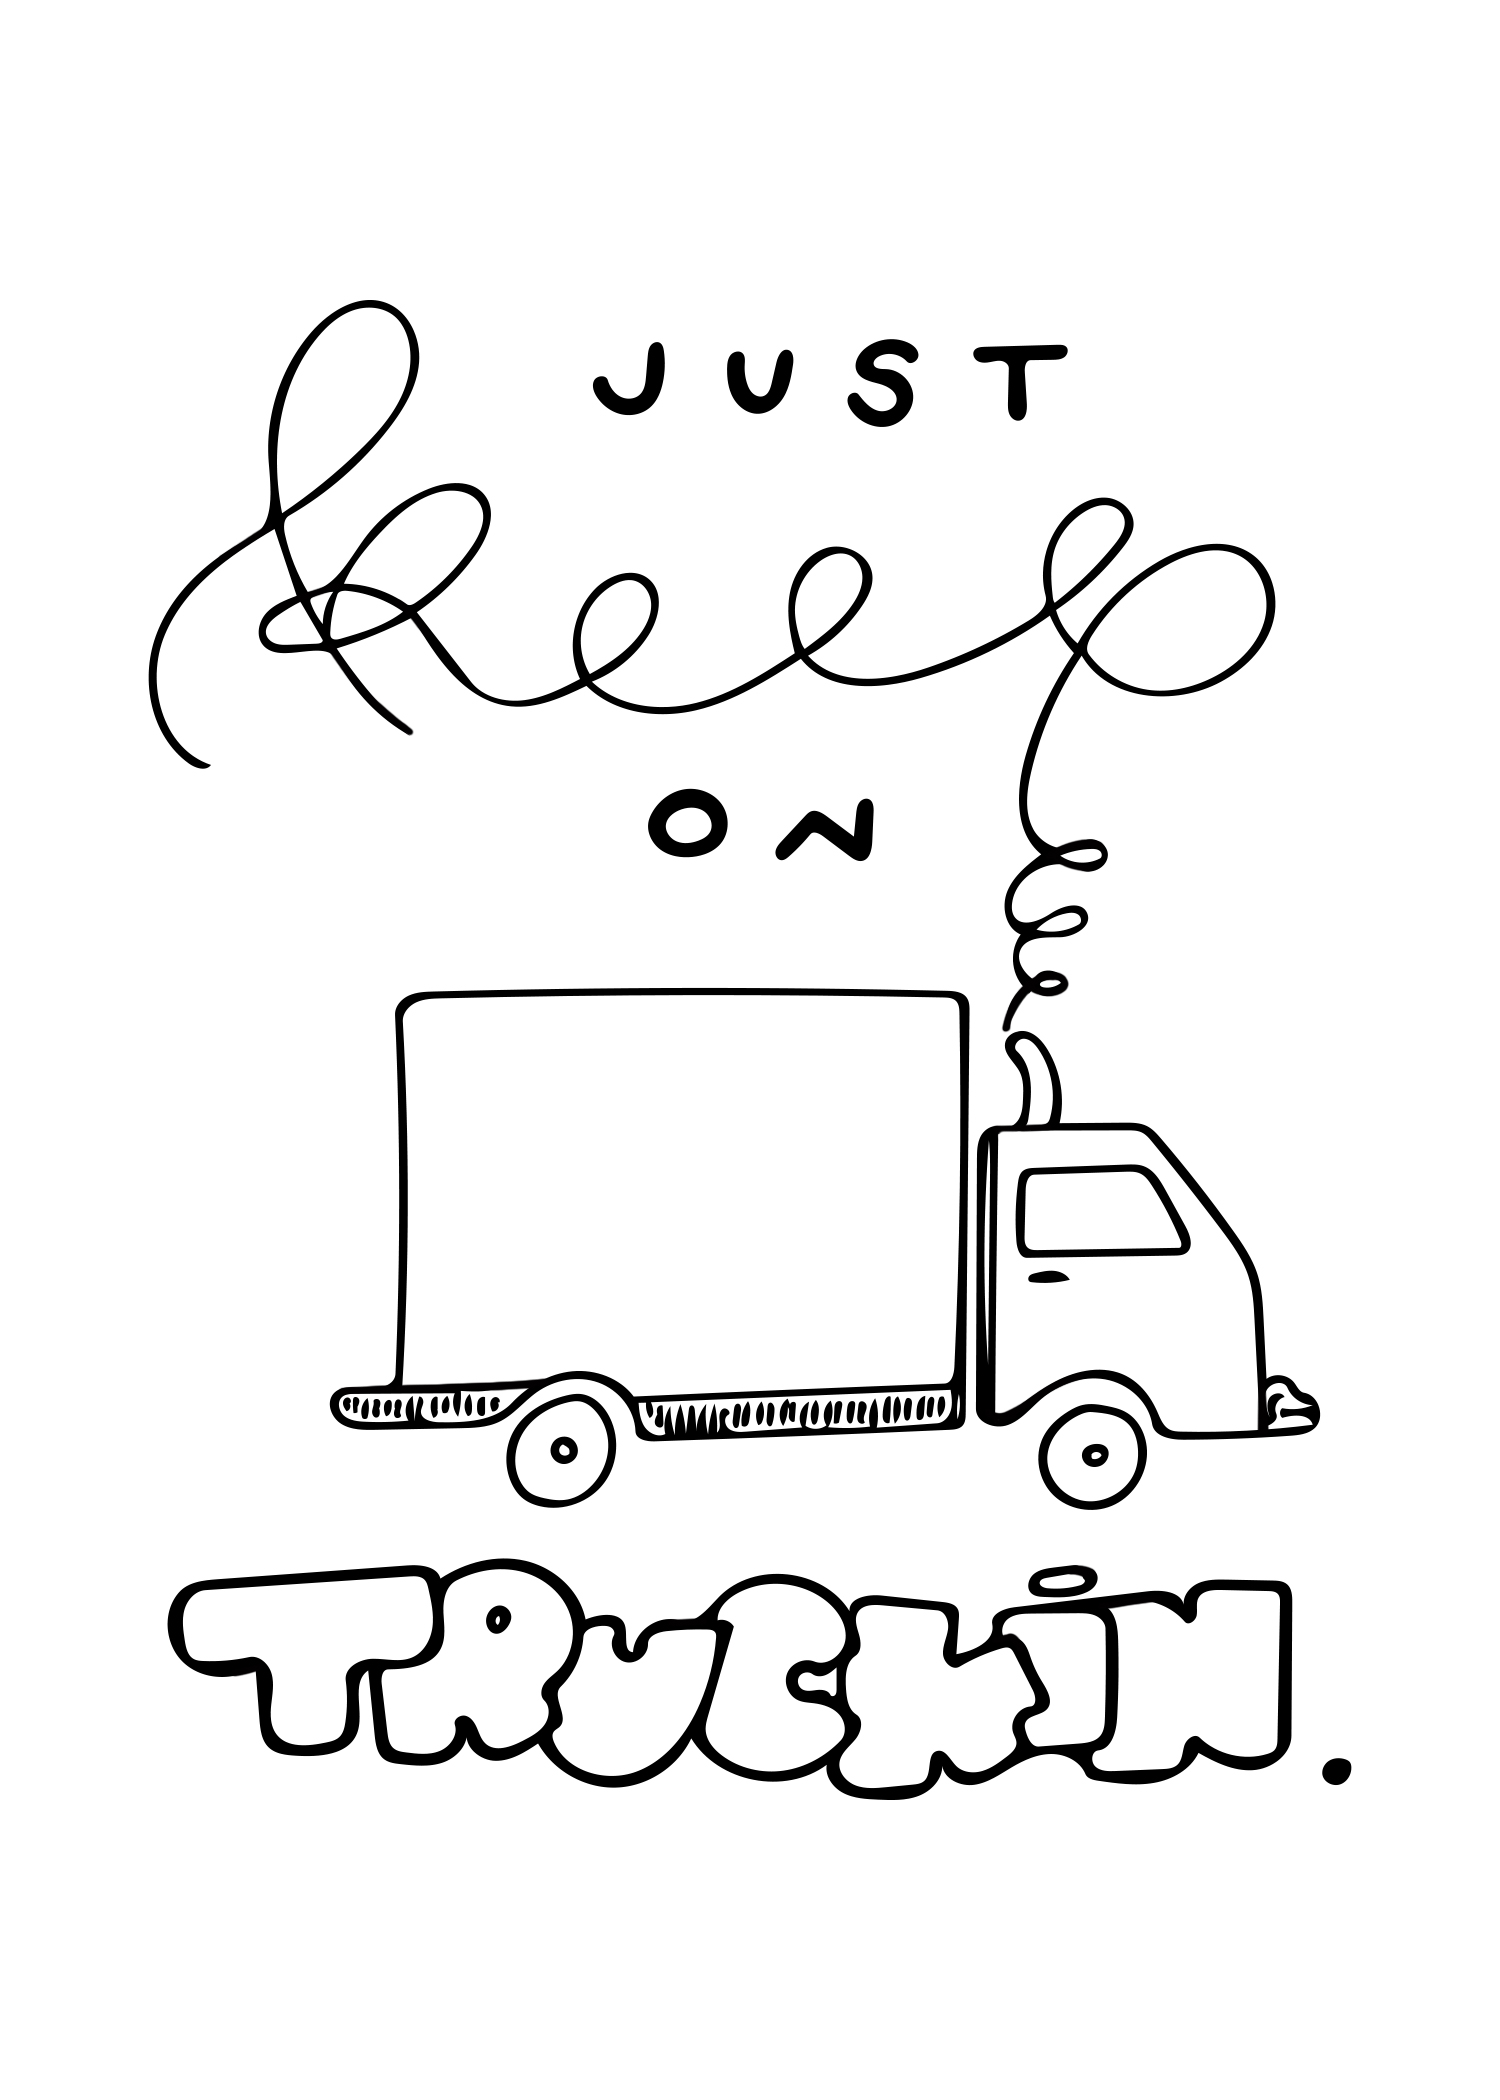 Just Keep on Truckin.jpg